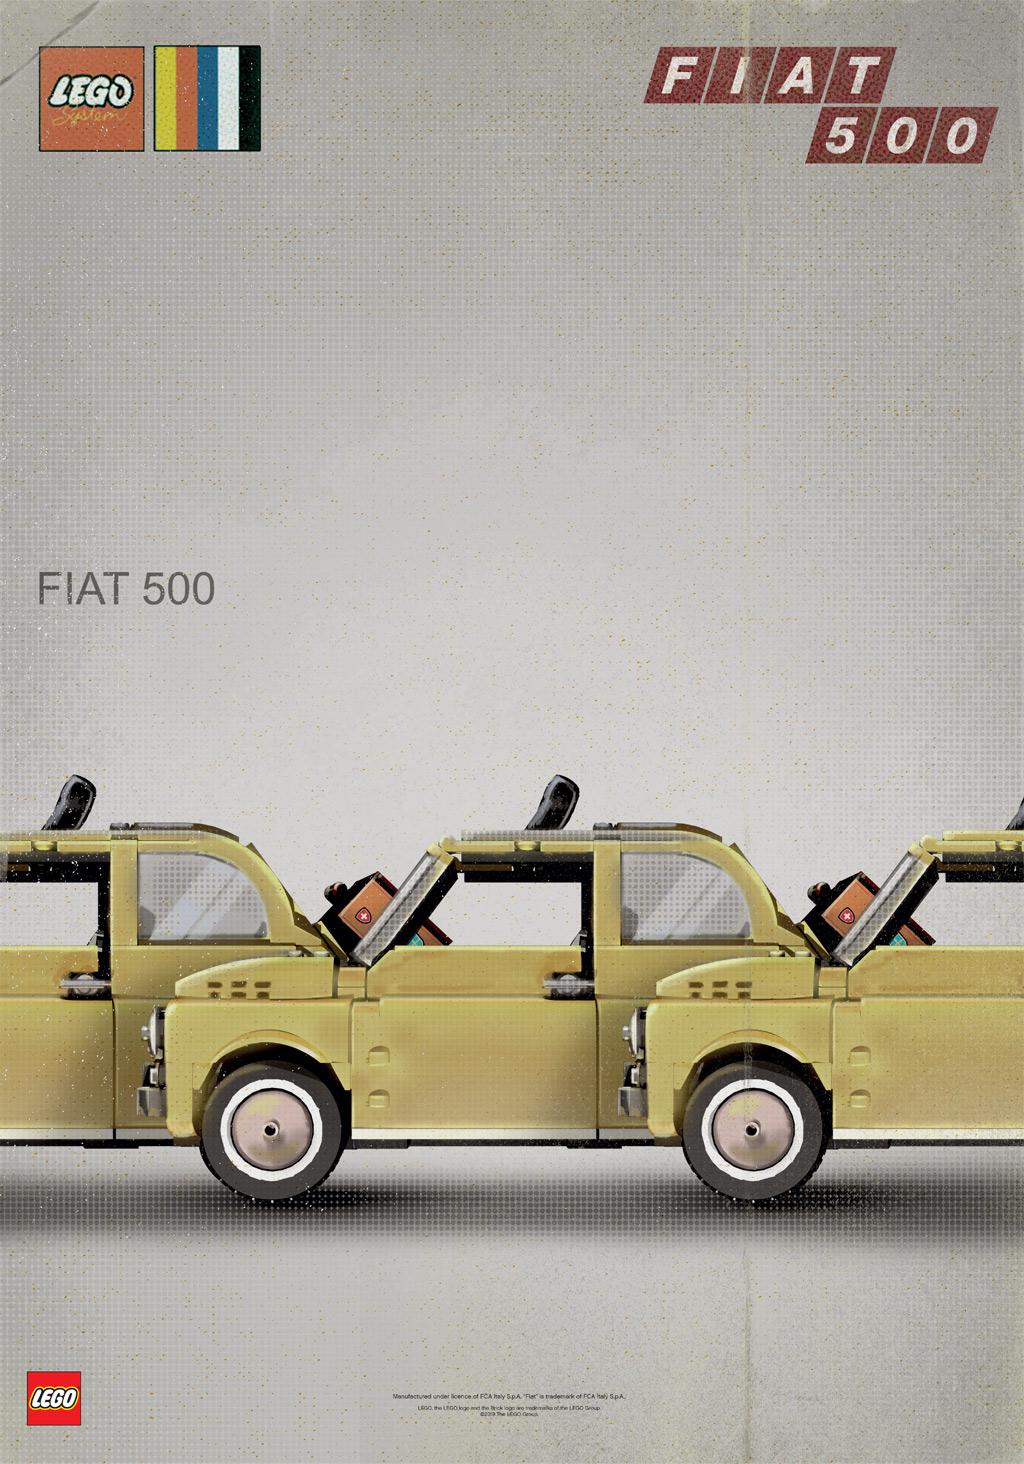 lego-creator-expert-10271-fiat-500-2020-poster-6 zusammengebaut.com